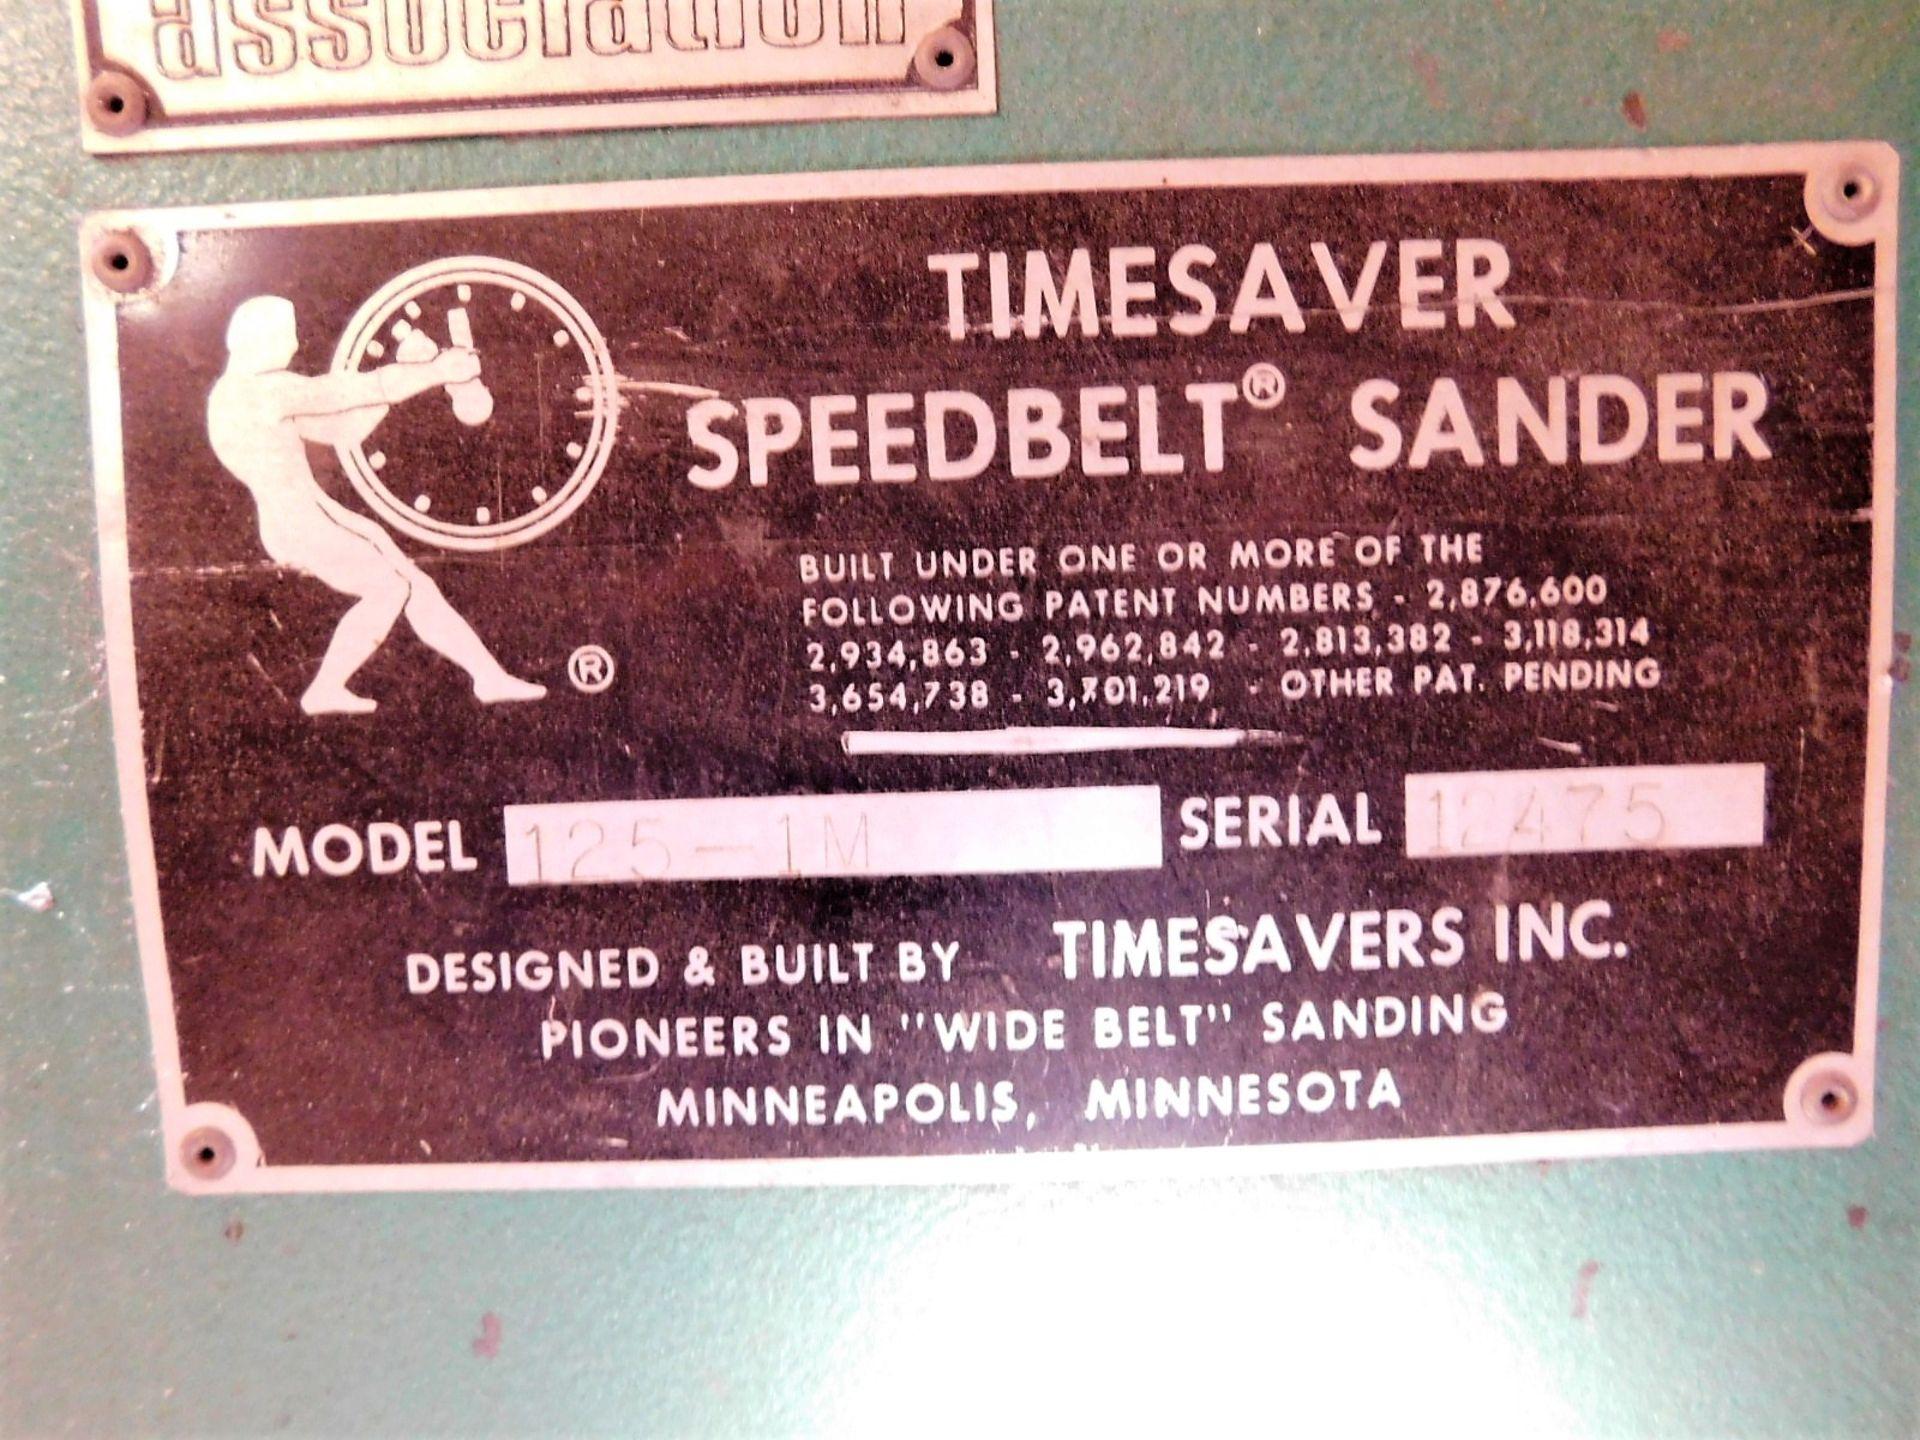 Lot 40 - TIMESAVER SPEEDBELT SANDER, MODEL 125-1M, S/N 12475